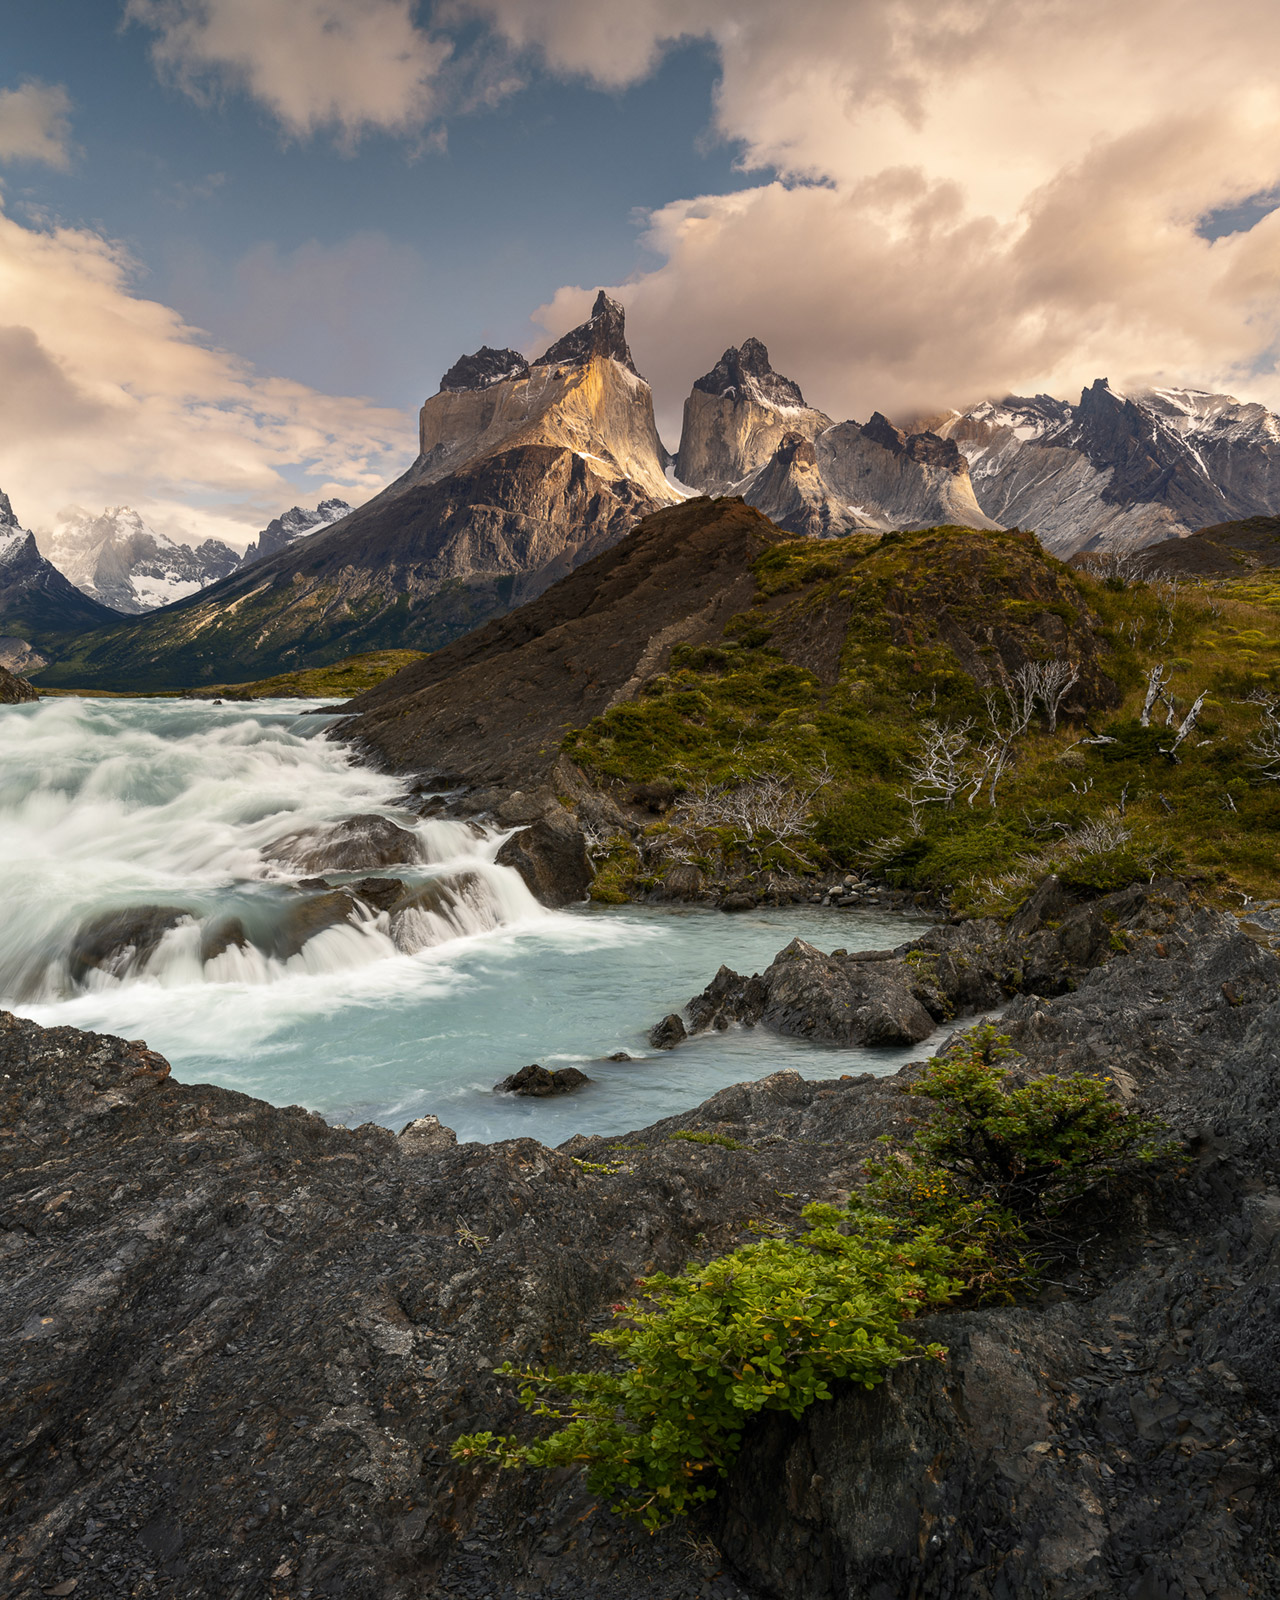 Patagonien in Chile Salto Grande - Stefan Schäfer Landschaftsfotograf